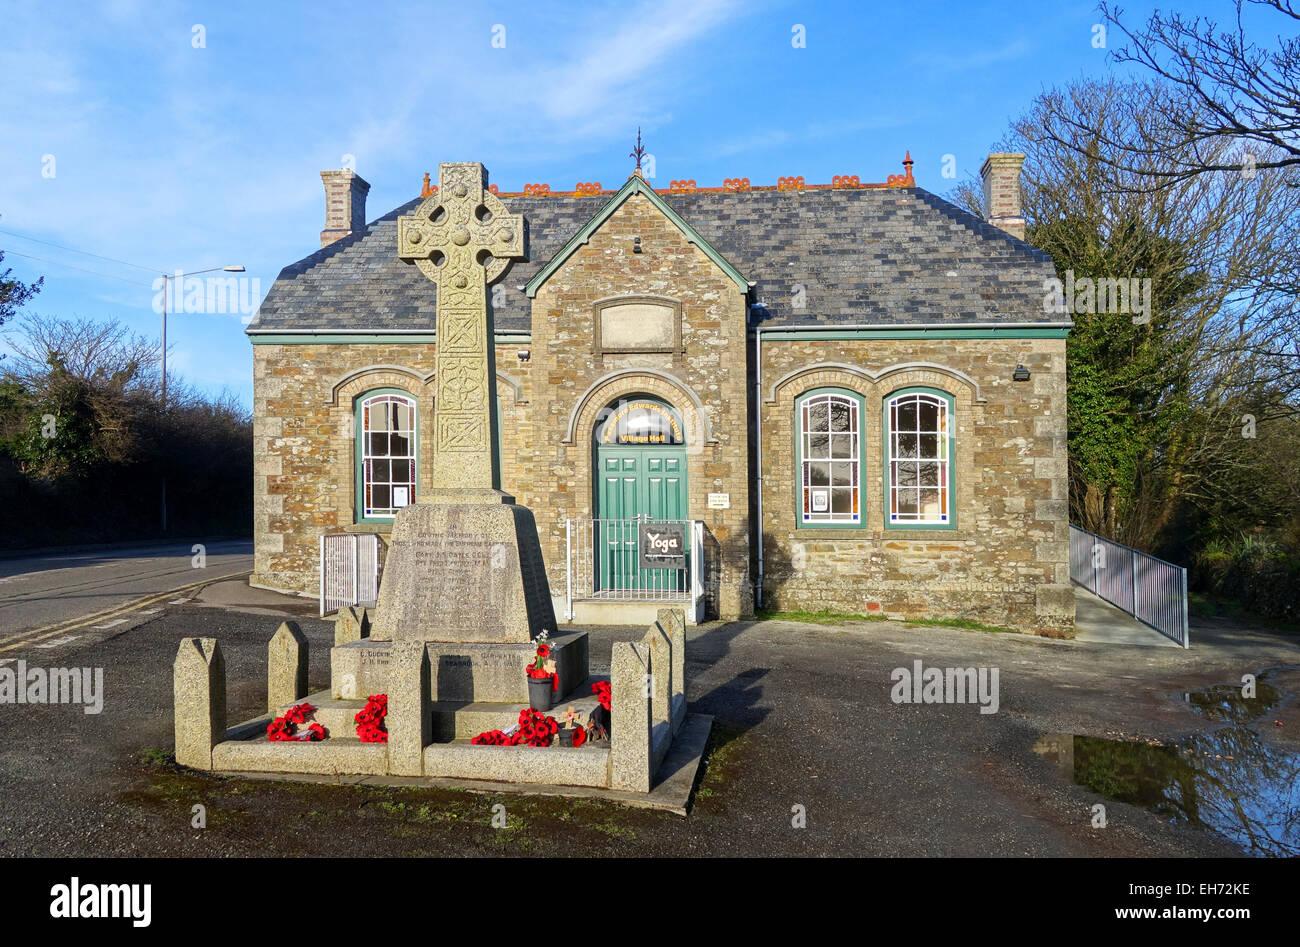 village hall - Stock Image